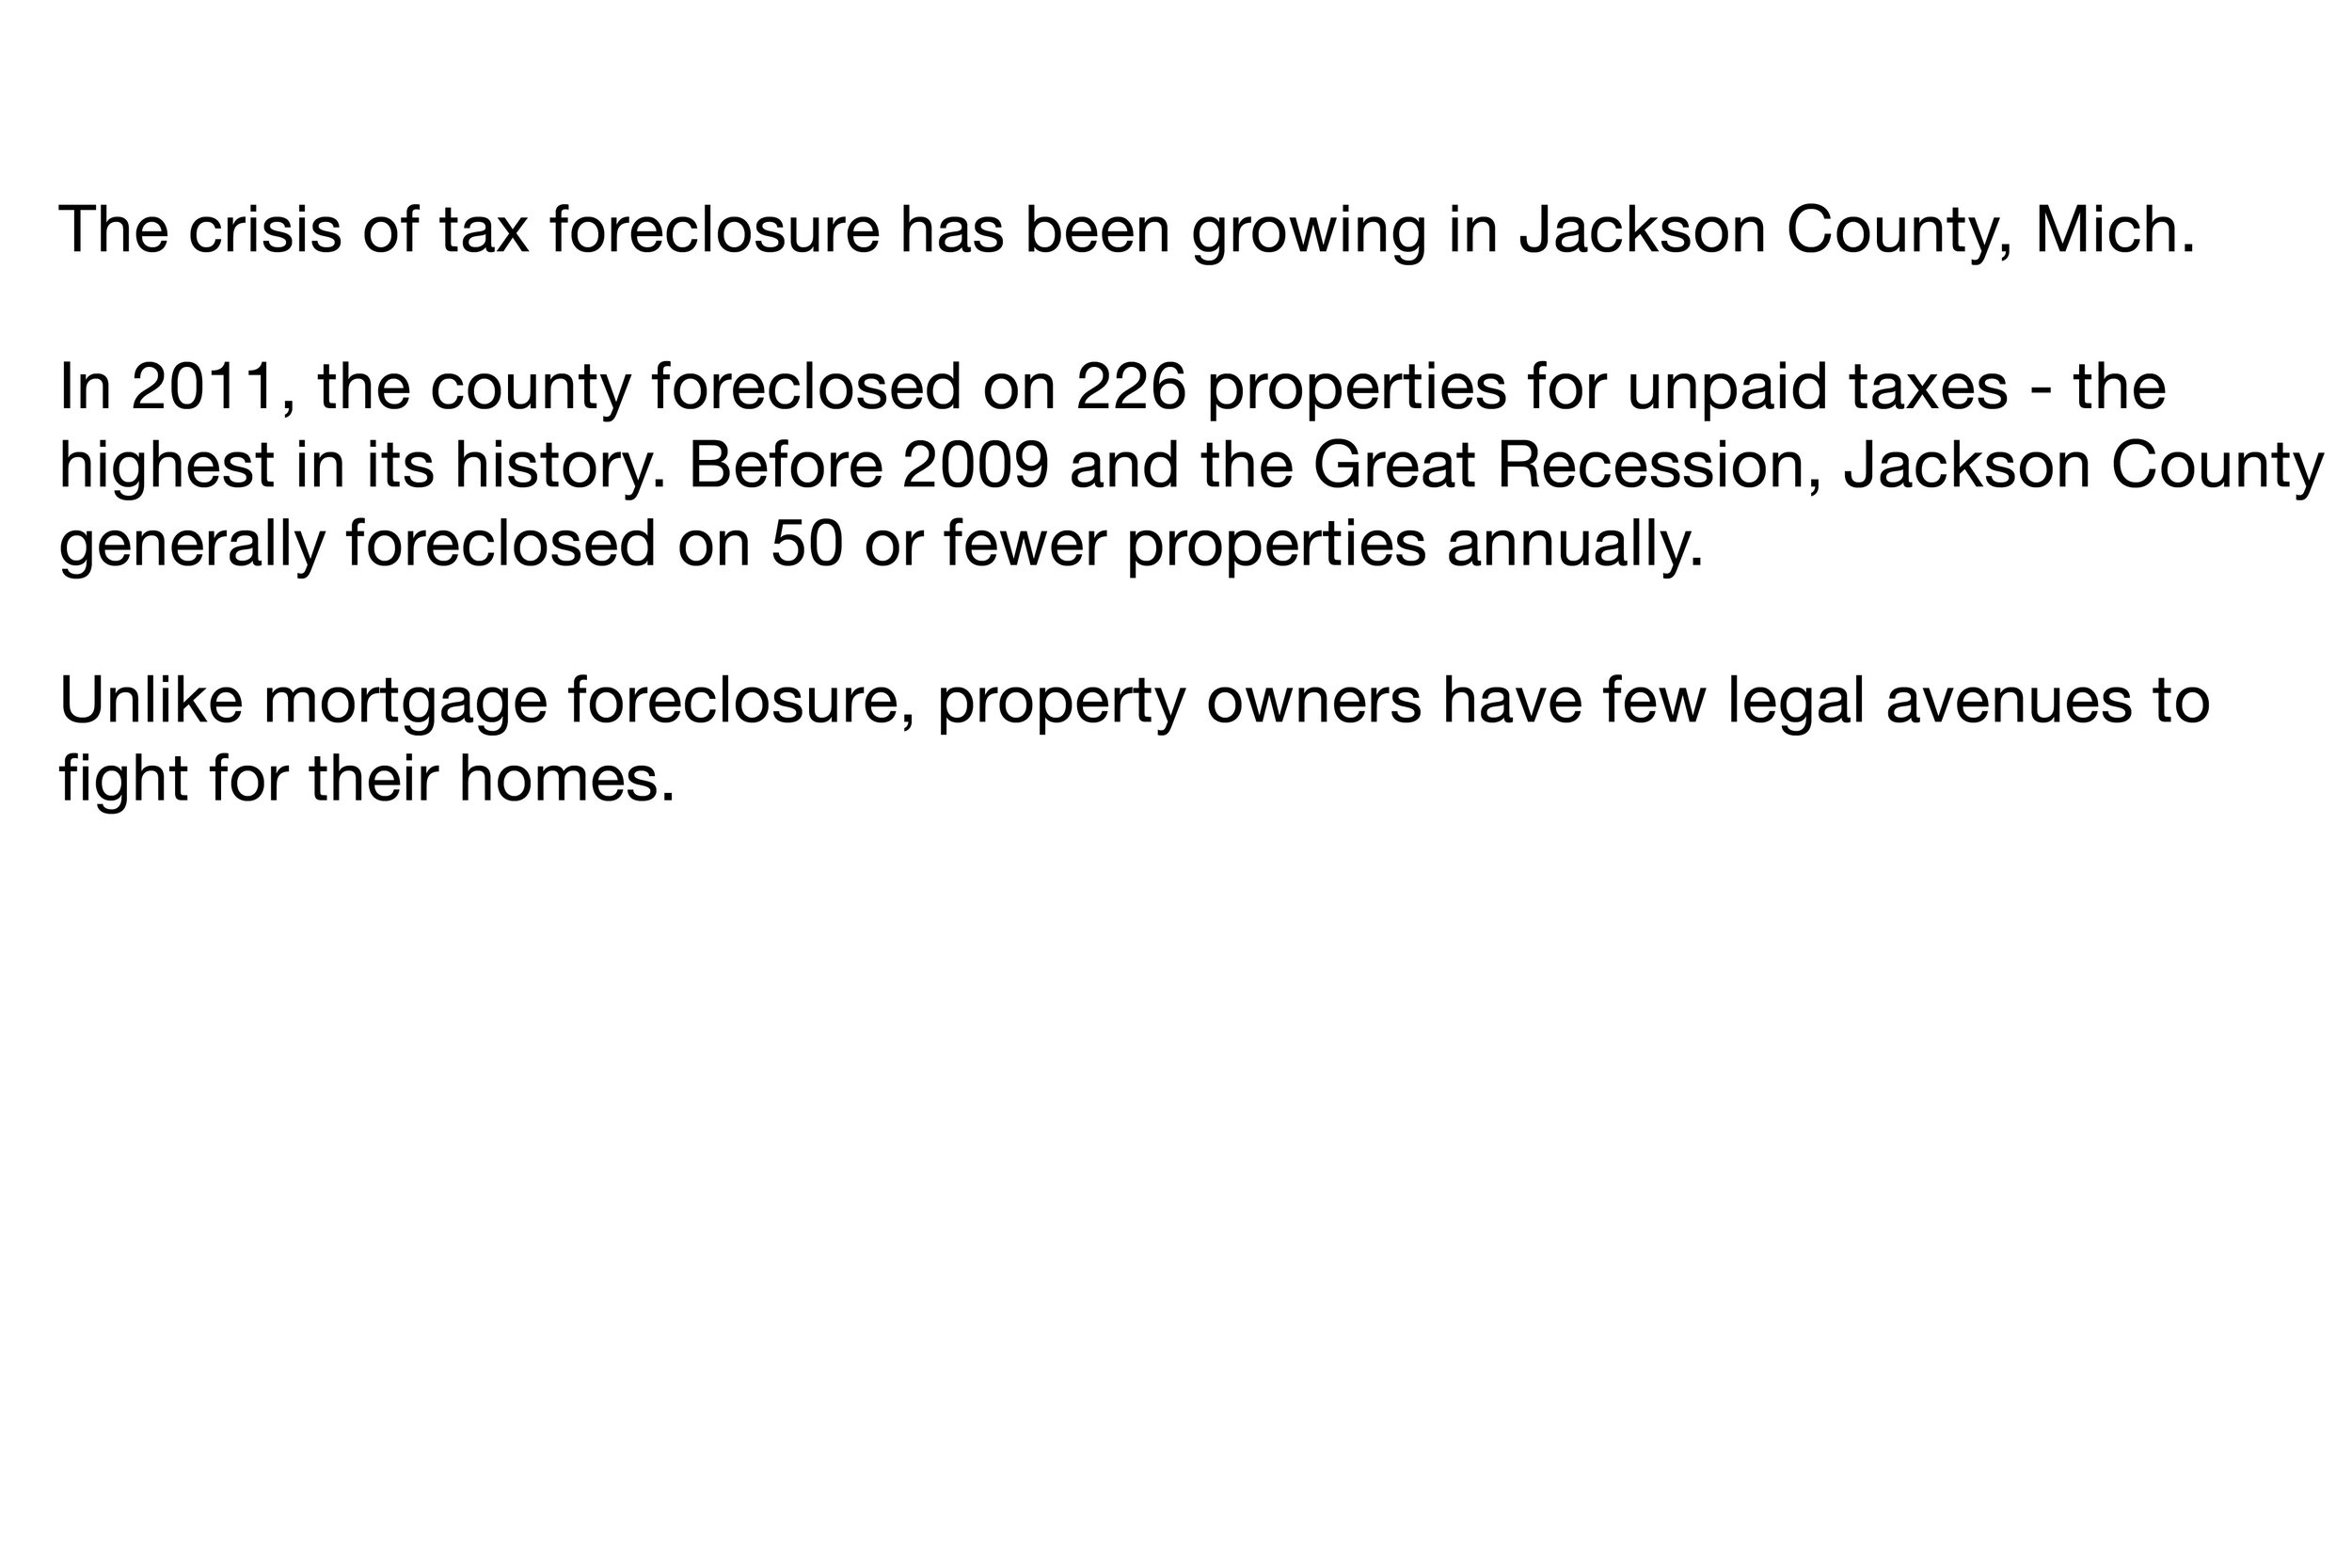 tax foreclosure description.jpg